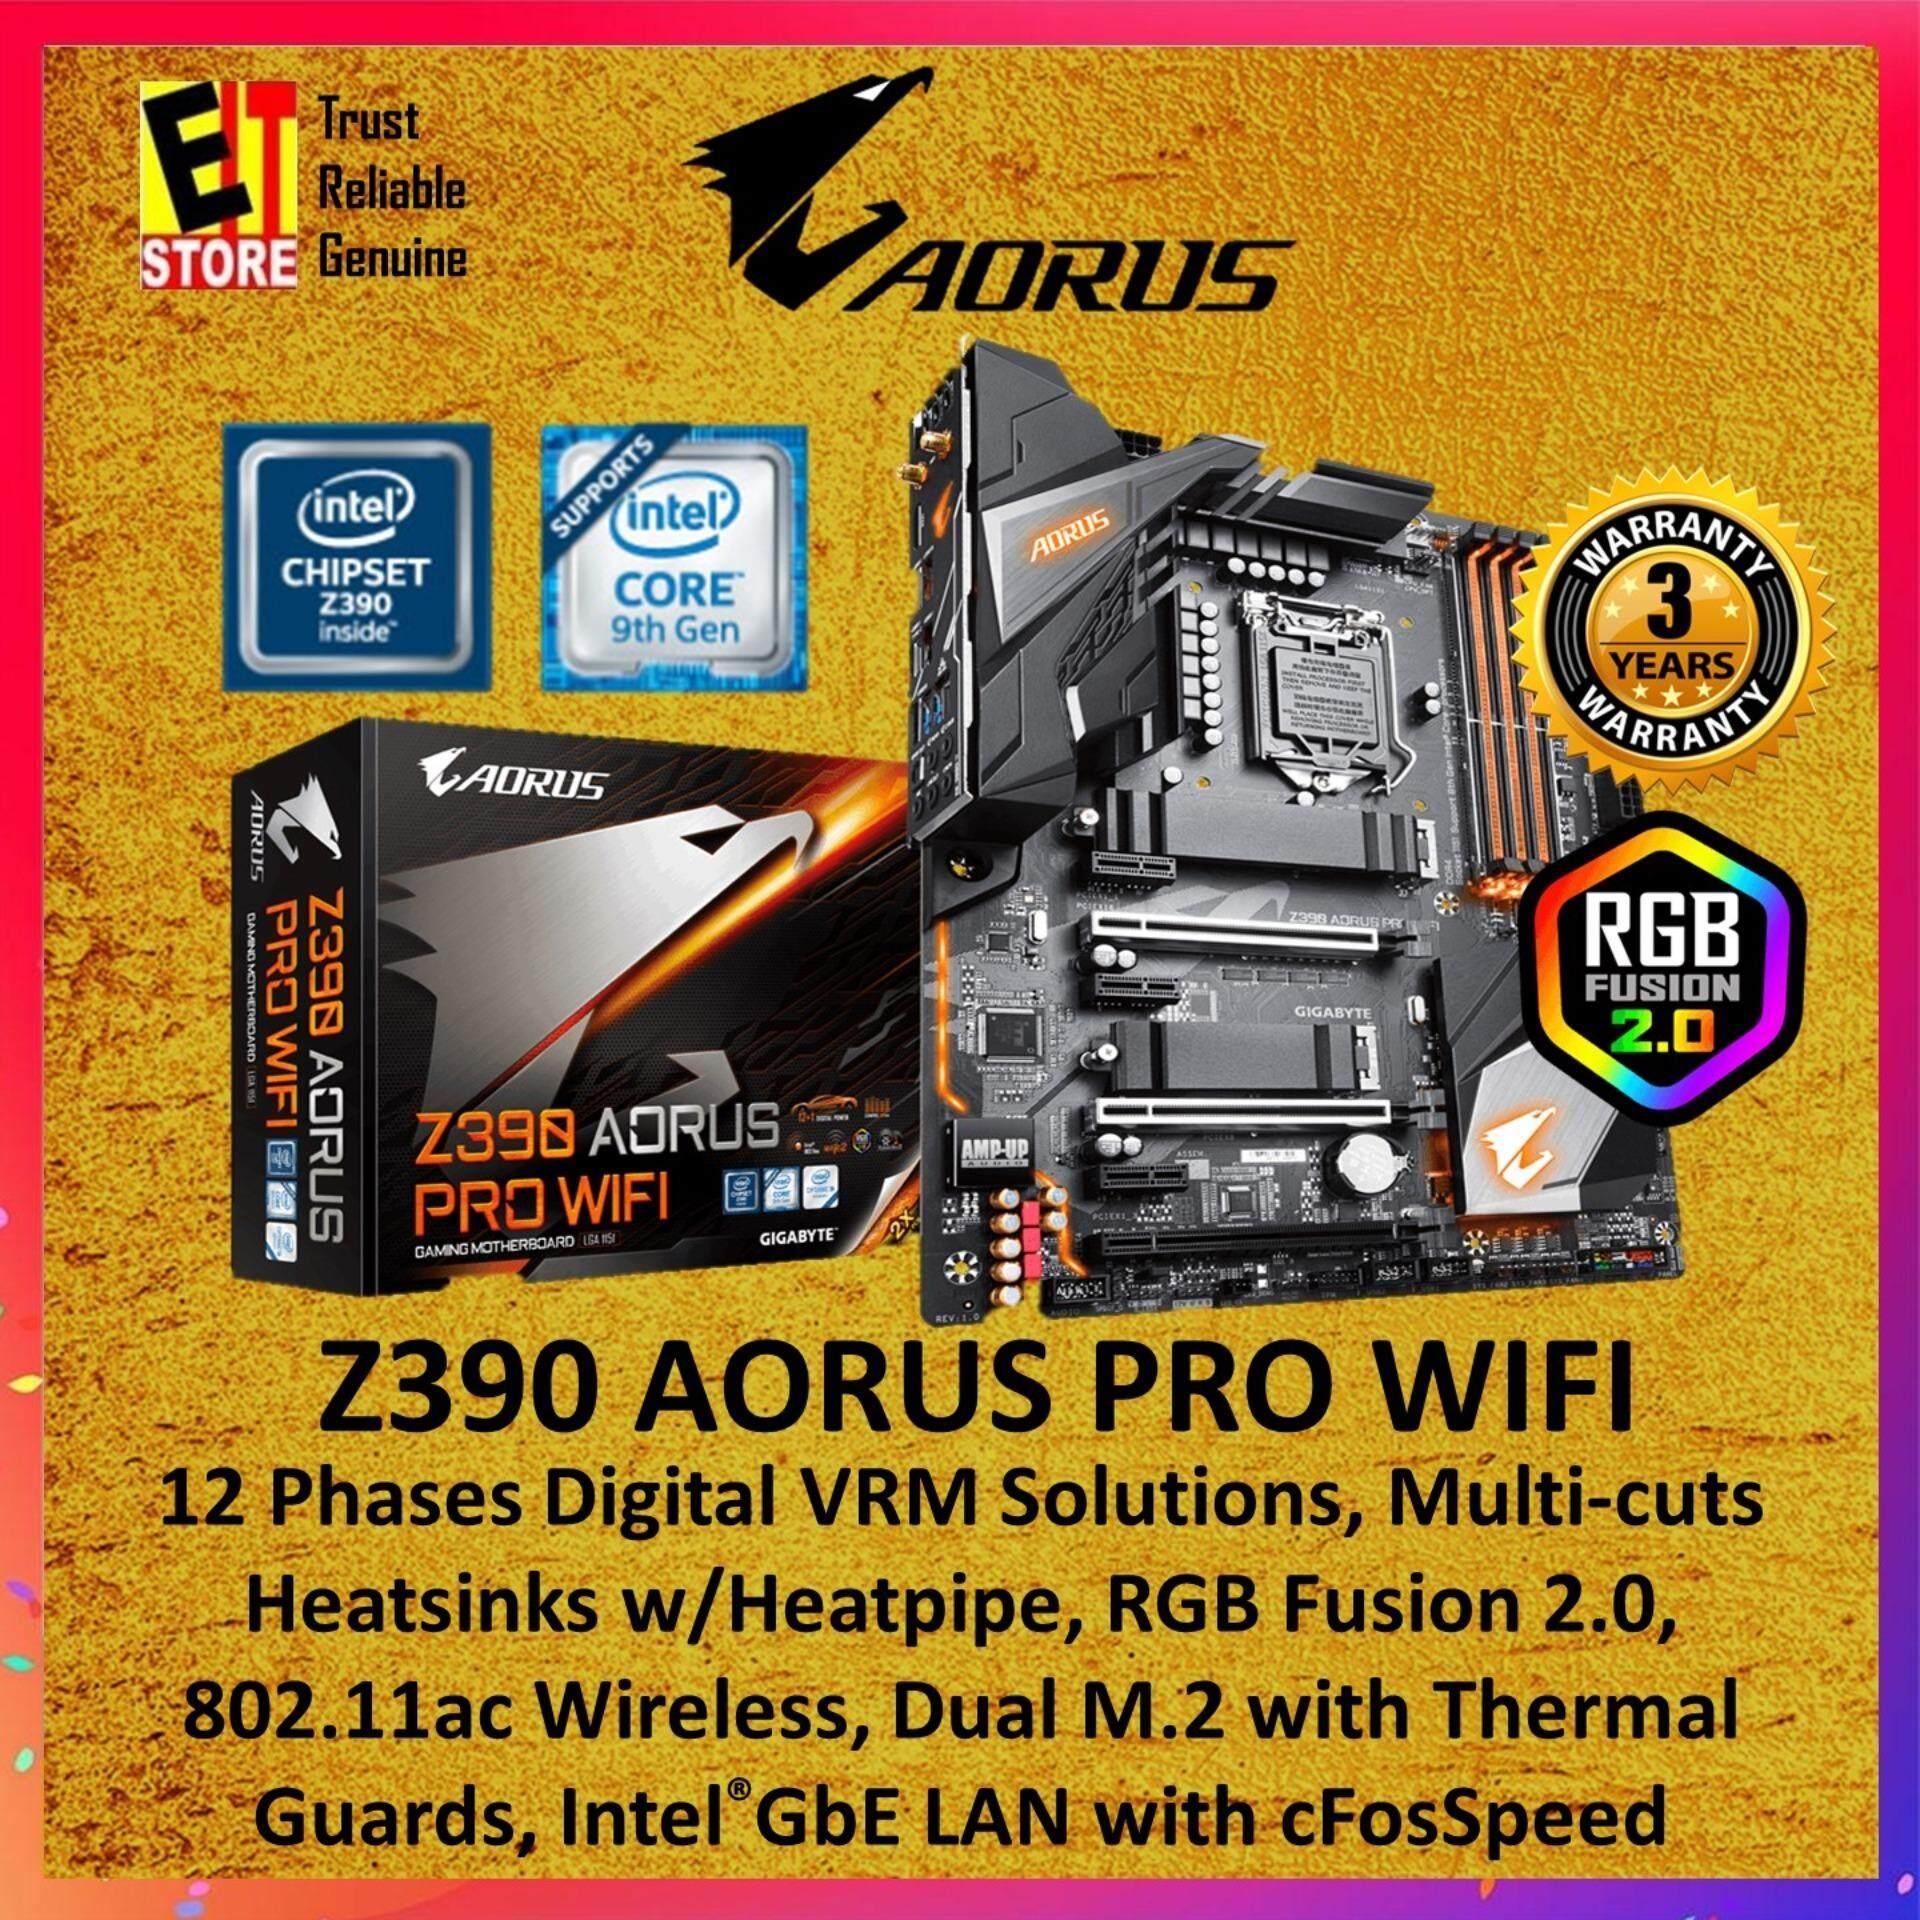 GIGABYTE Z390 AORUS PRO WIFI Ultra Durable Gaming Motherboard (Intel  LGA1151)